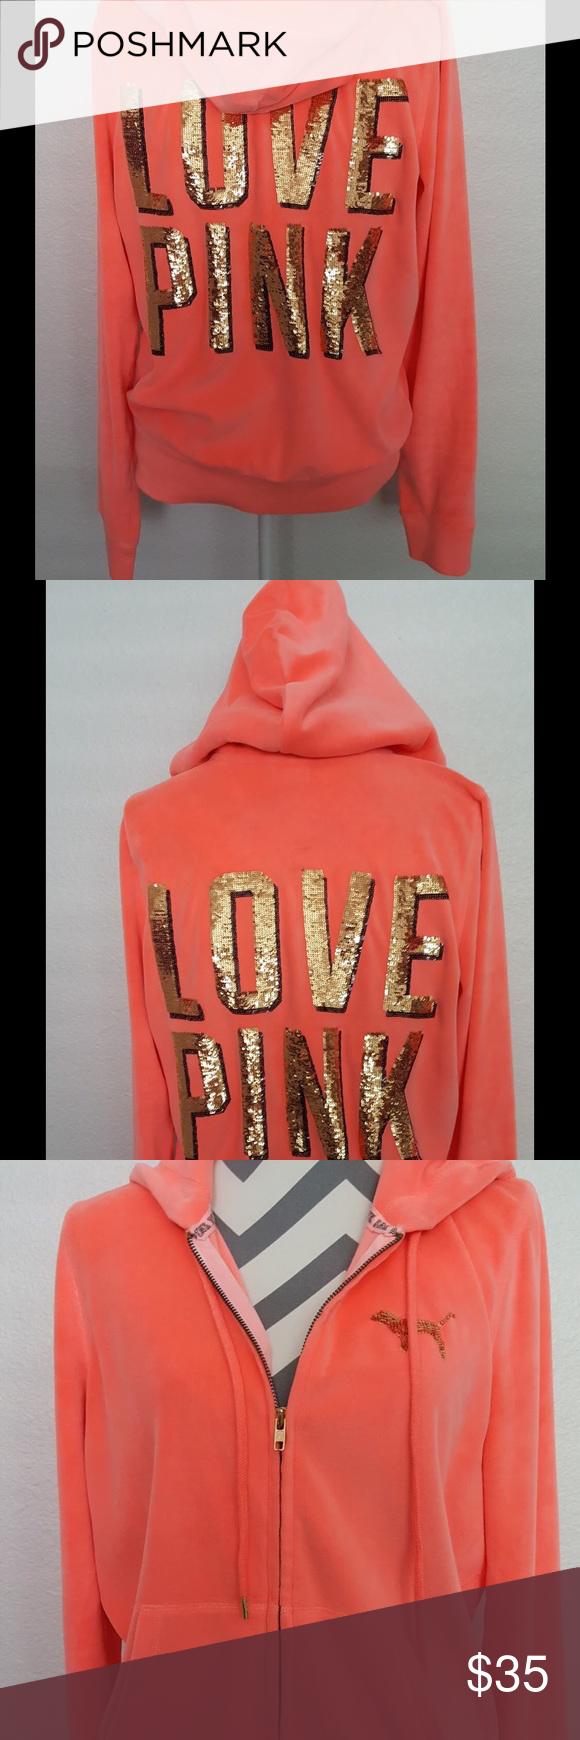 5bc0b75c5c9 Hoodie by PINK Victoria s Secret Zip up Jacket Soft velour neon coral zip  up hoodie